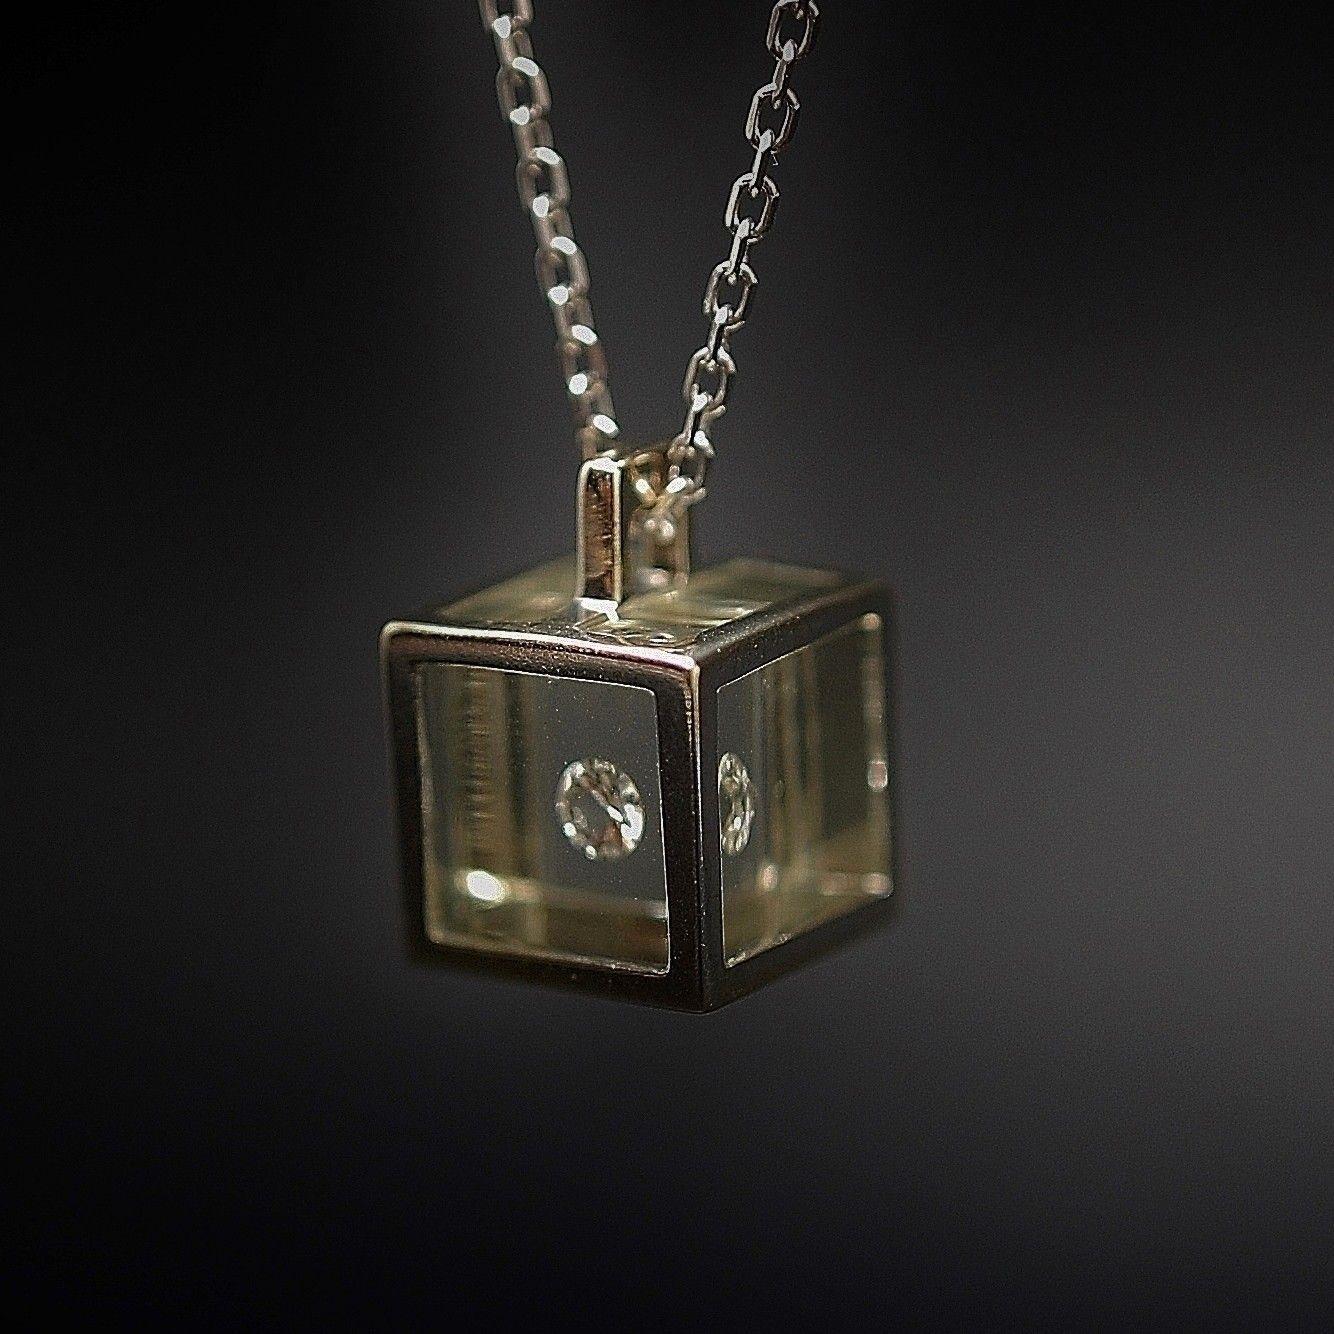 Modele de pendentif en diamant